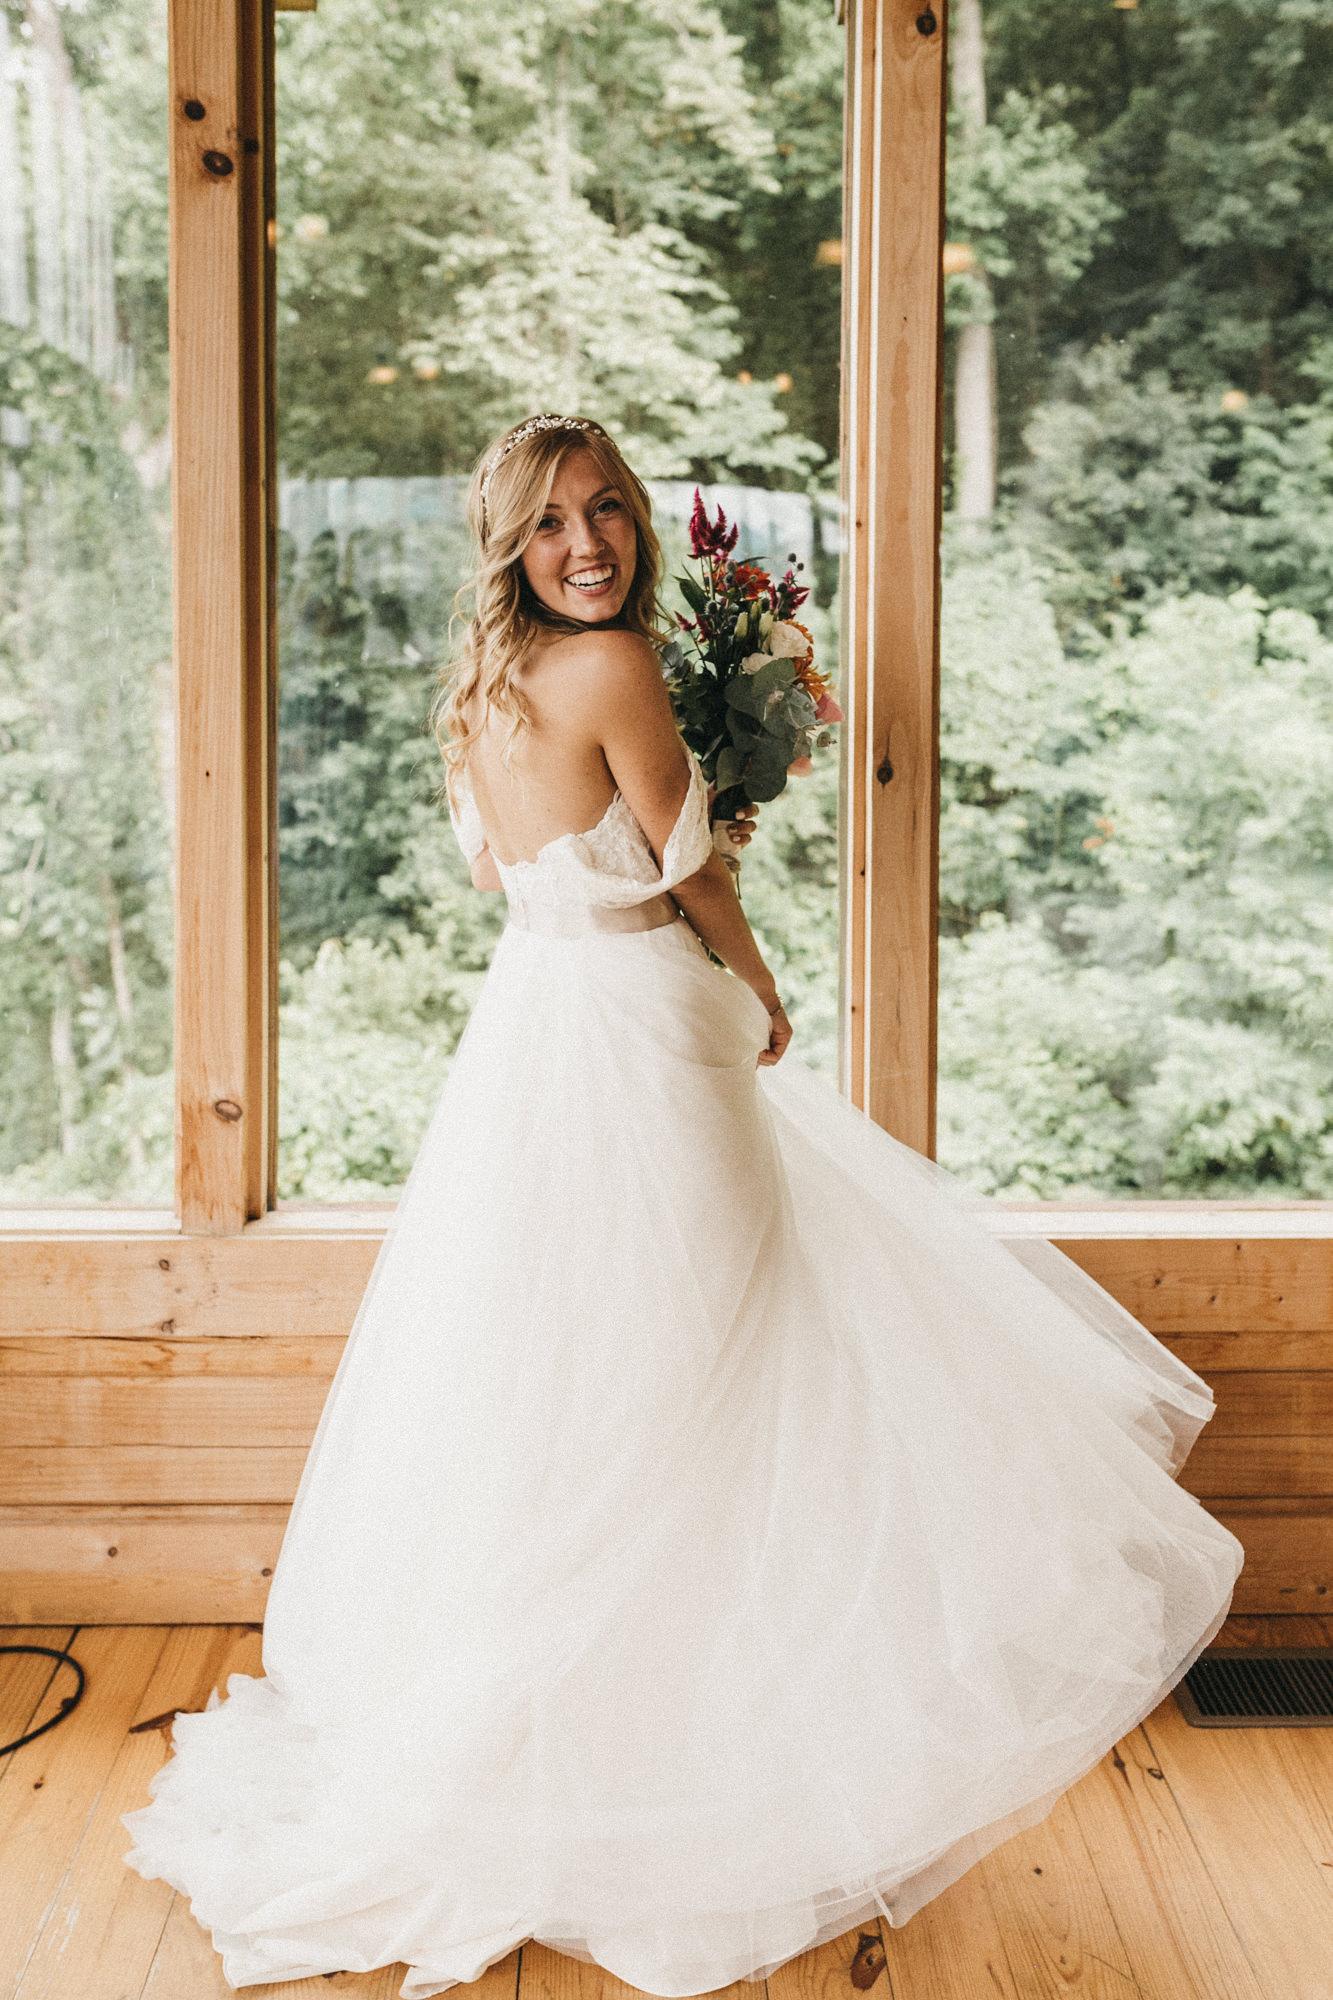 nashville_tennessee_wedding_photographer-50.jpg